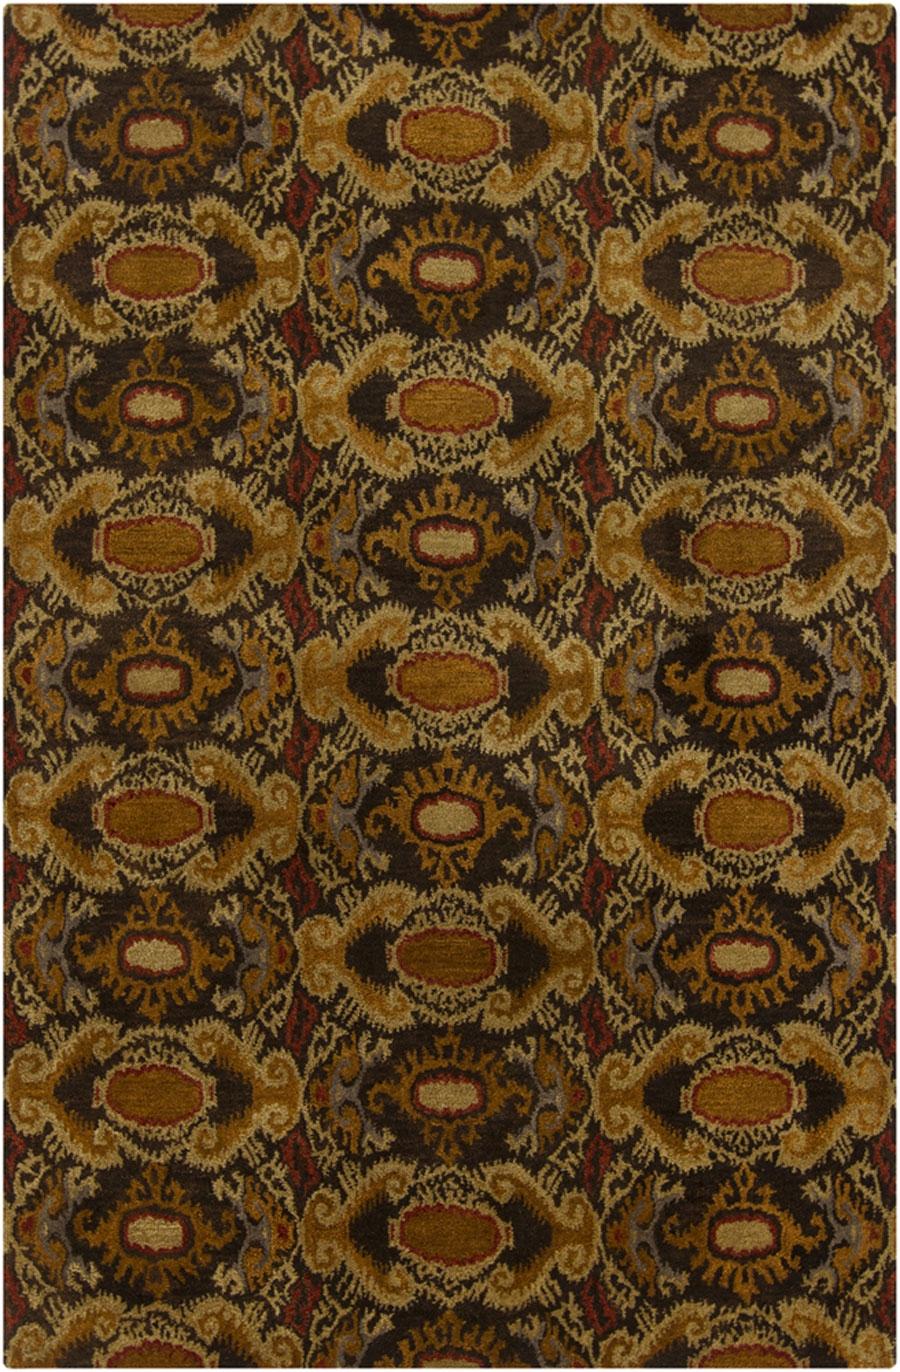 chandra rupec rup39622 area rug